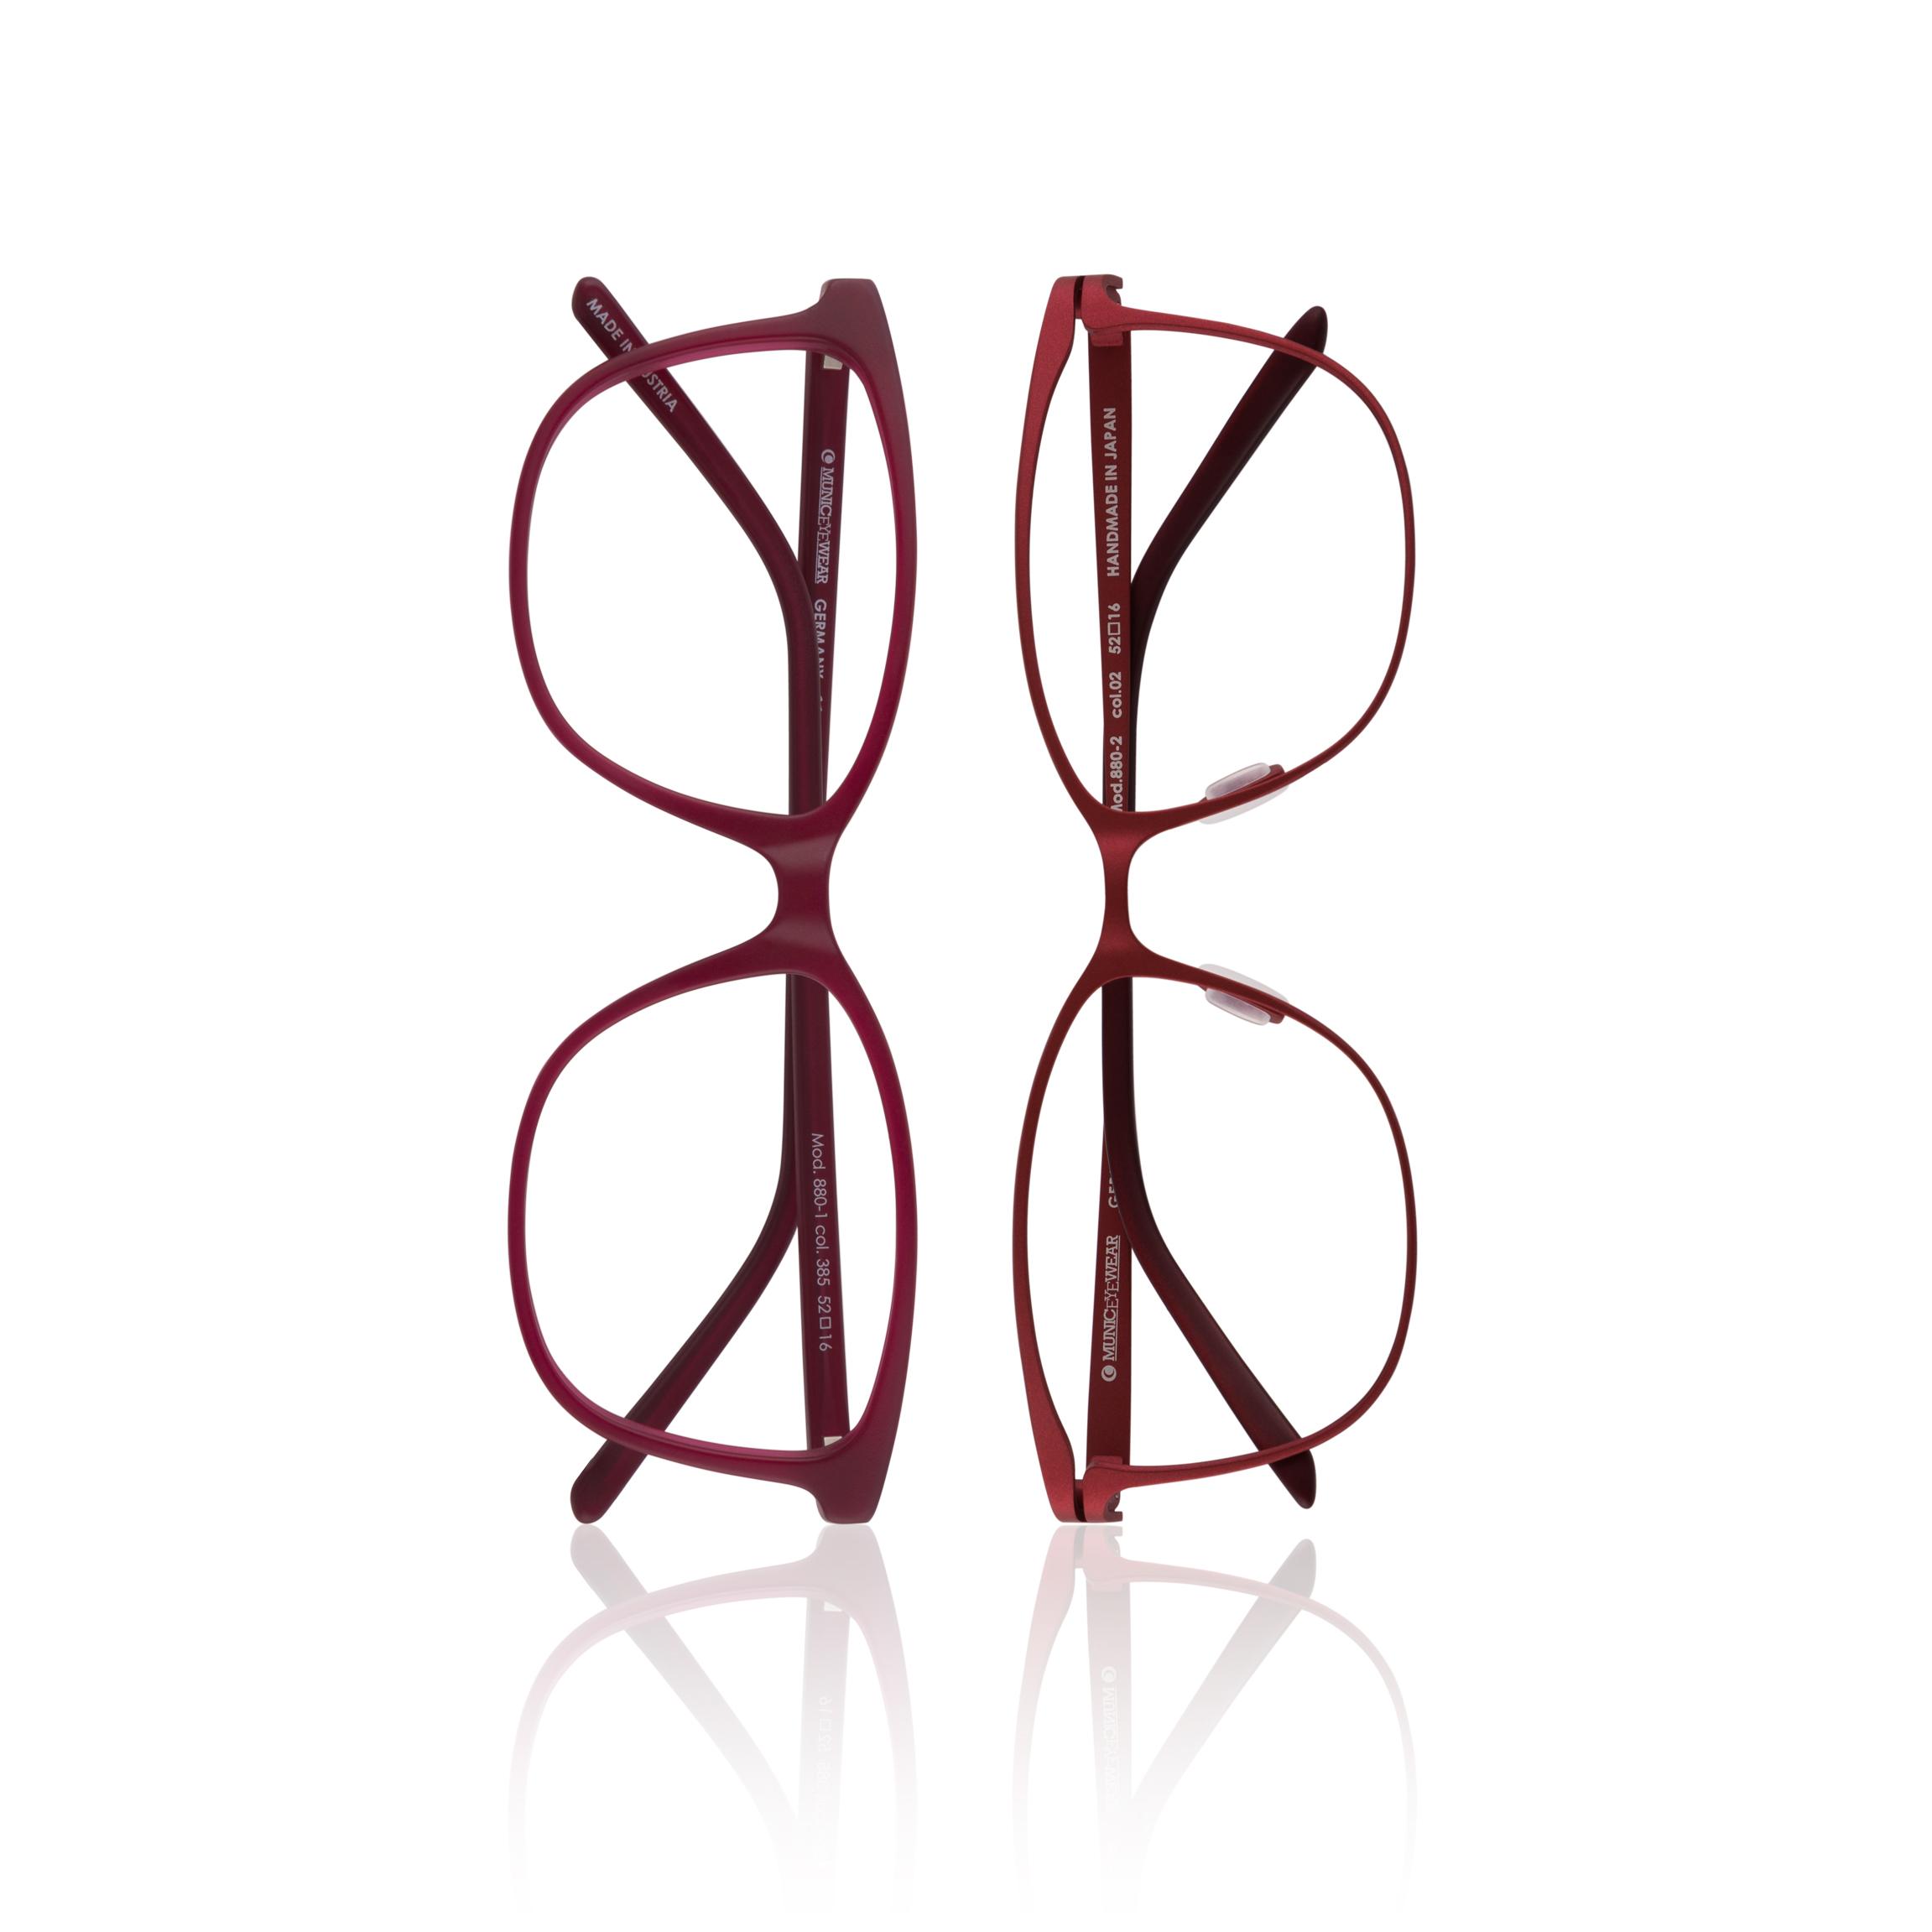 MunicEyeWear - Korrekturbrille : Twins - Mod 880-1+2